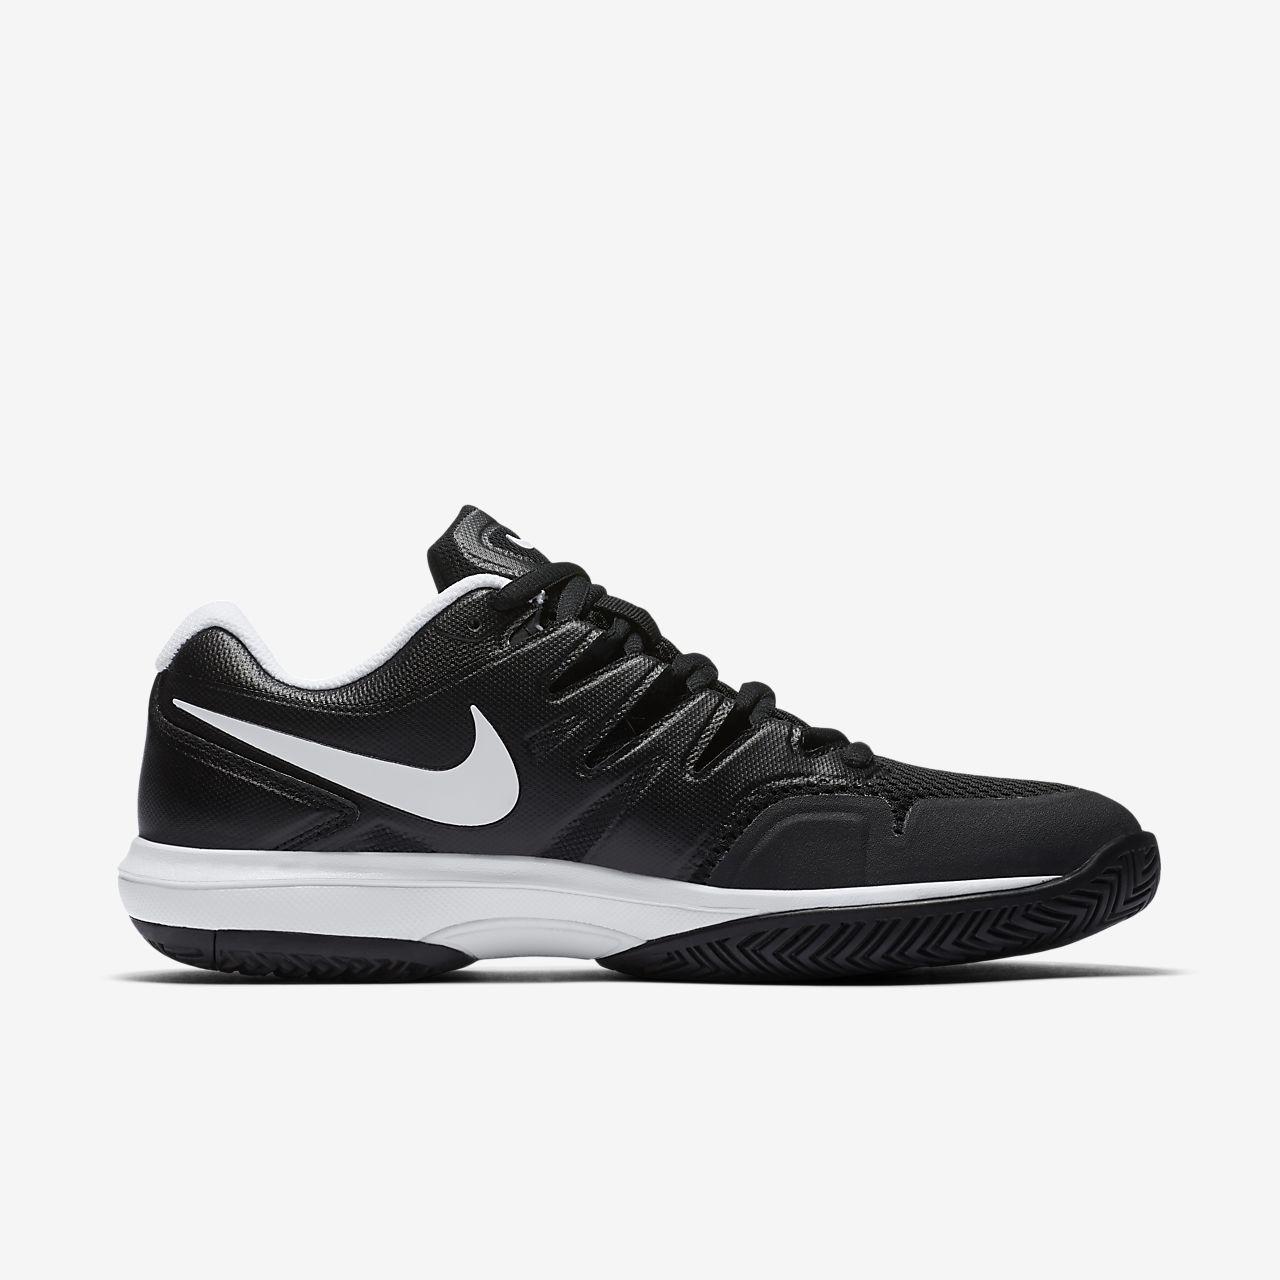 0dcfa8ada17b1 ... Calzado de tenis para cancha dura para hombre NikeCourt Air Zoom  Prestige